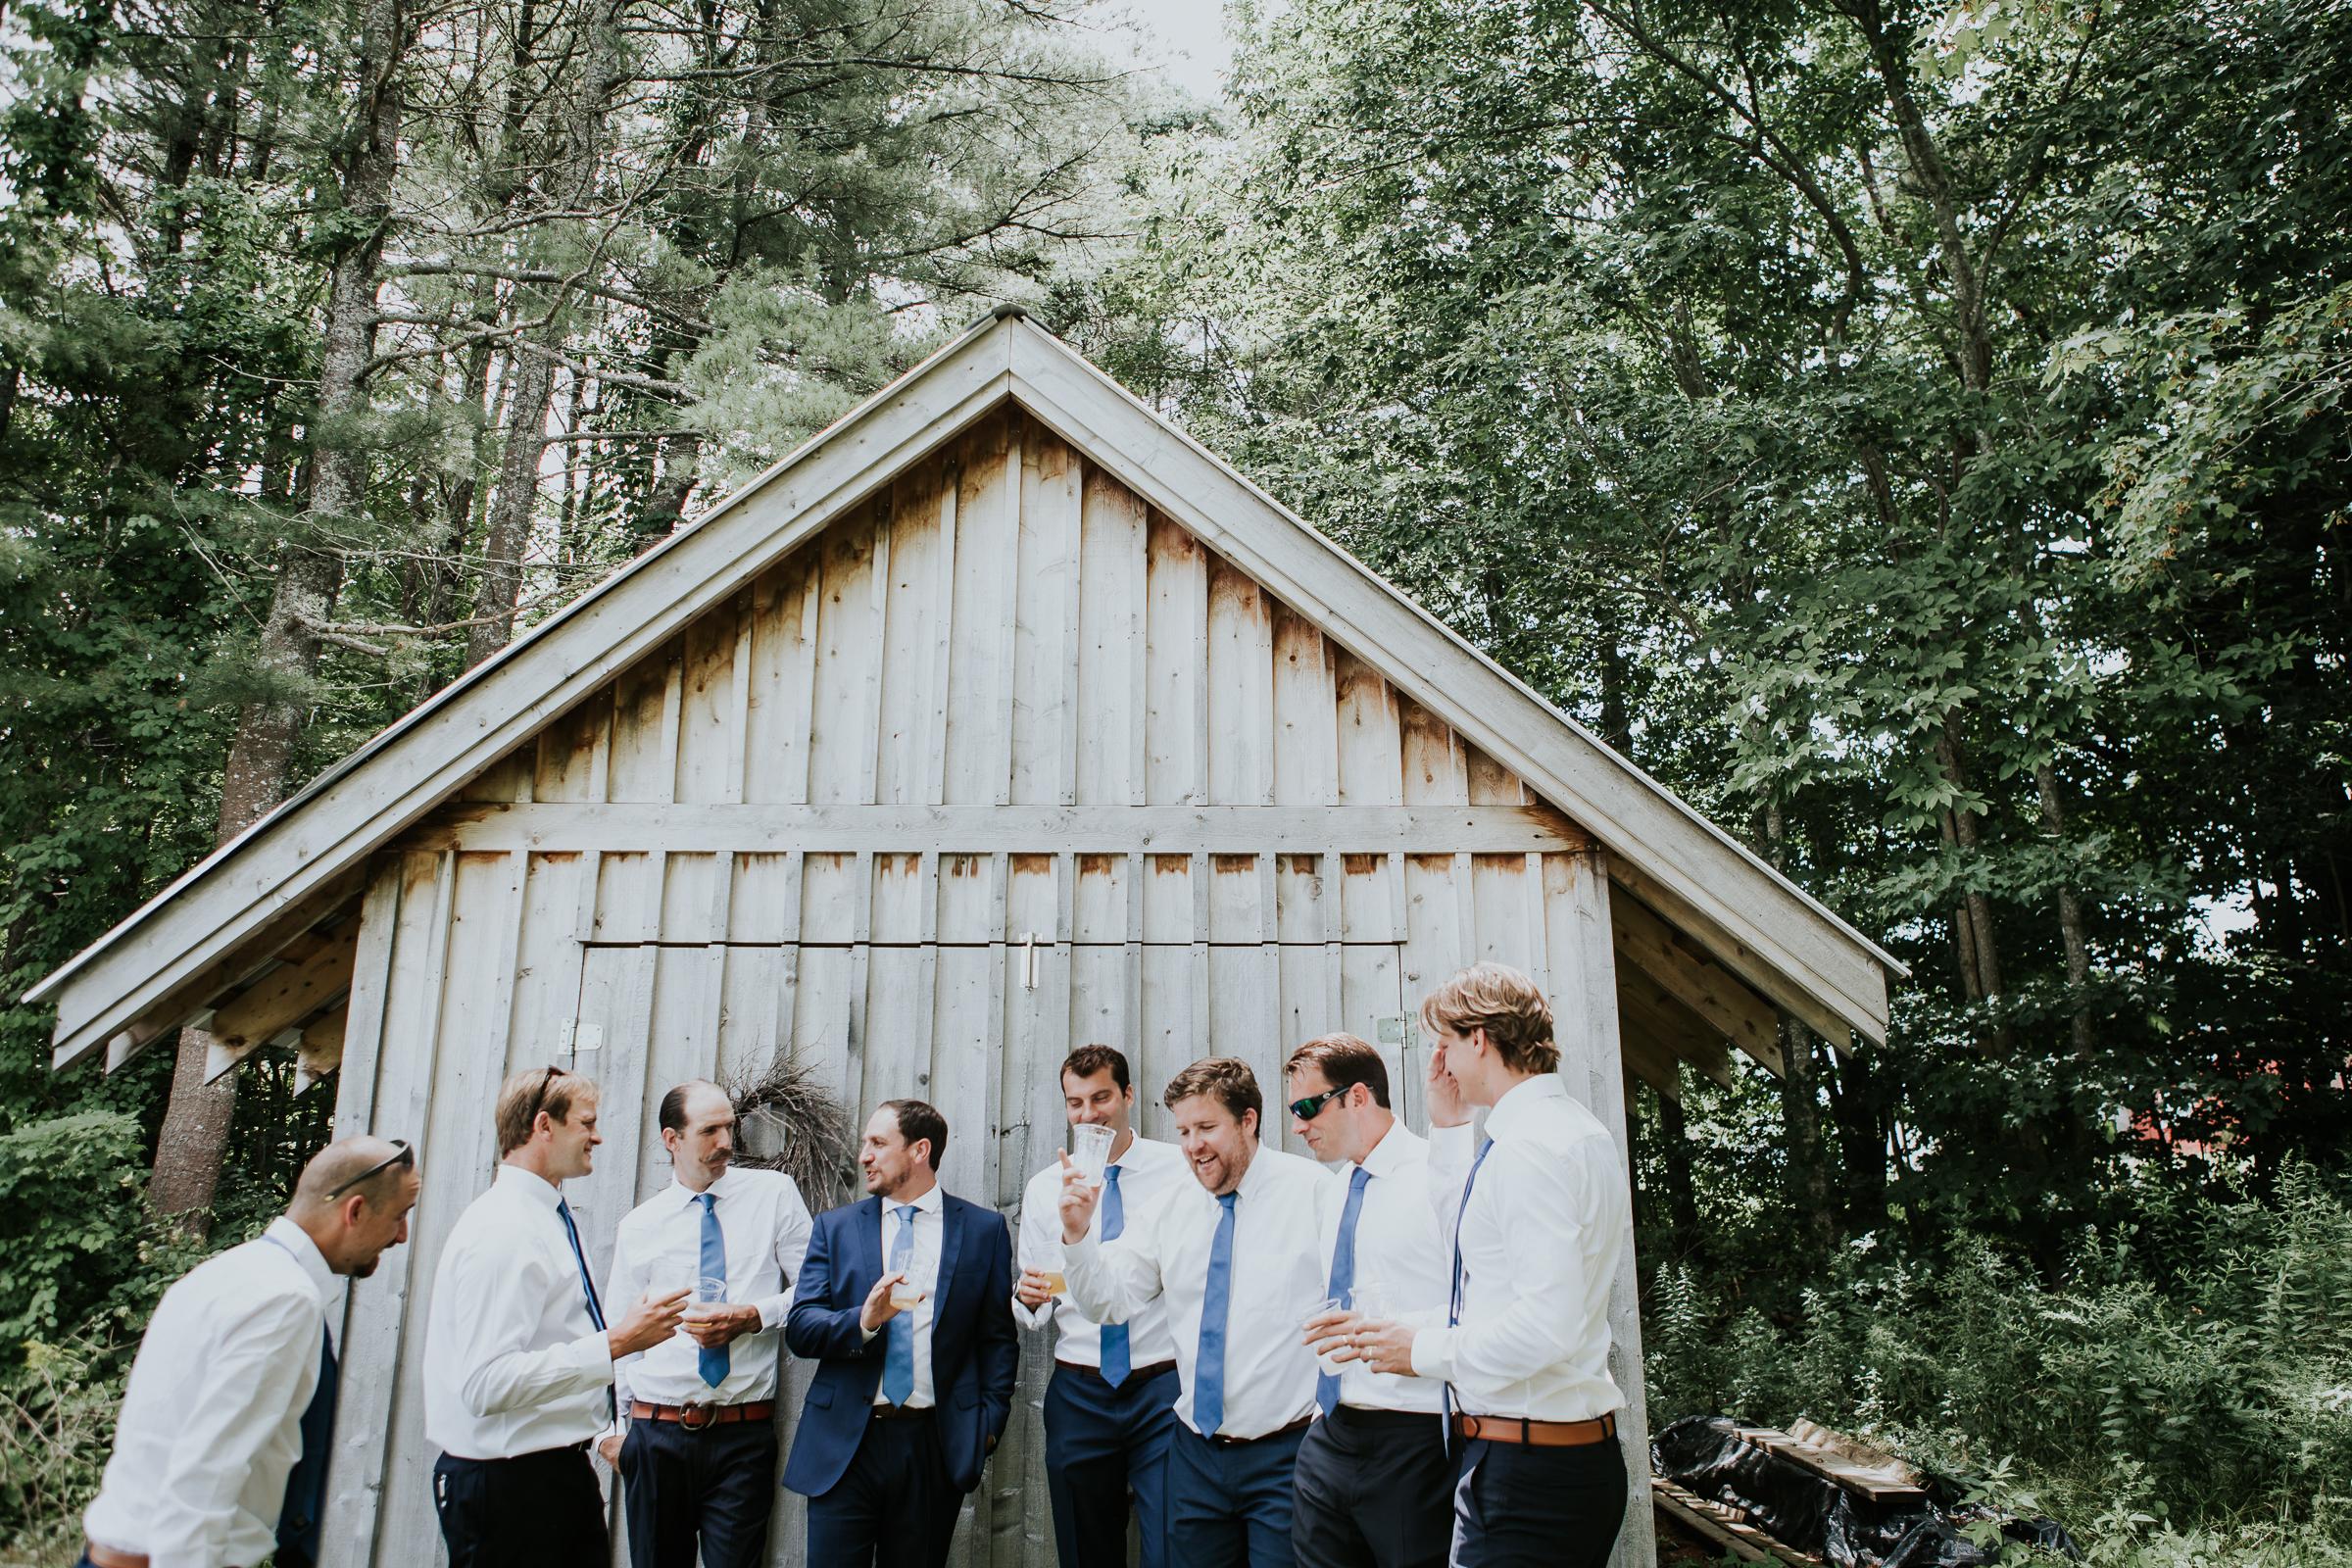 Marianmade-Farm-Wiscasset-Maine-Fine-Art-Documentary-Wedding-Photographer-Elvira-Kalviste-Photography-26.jpg